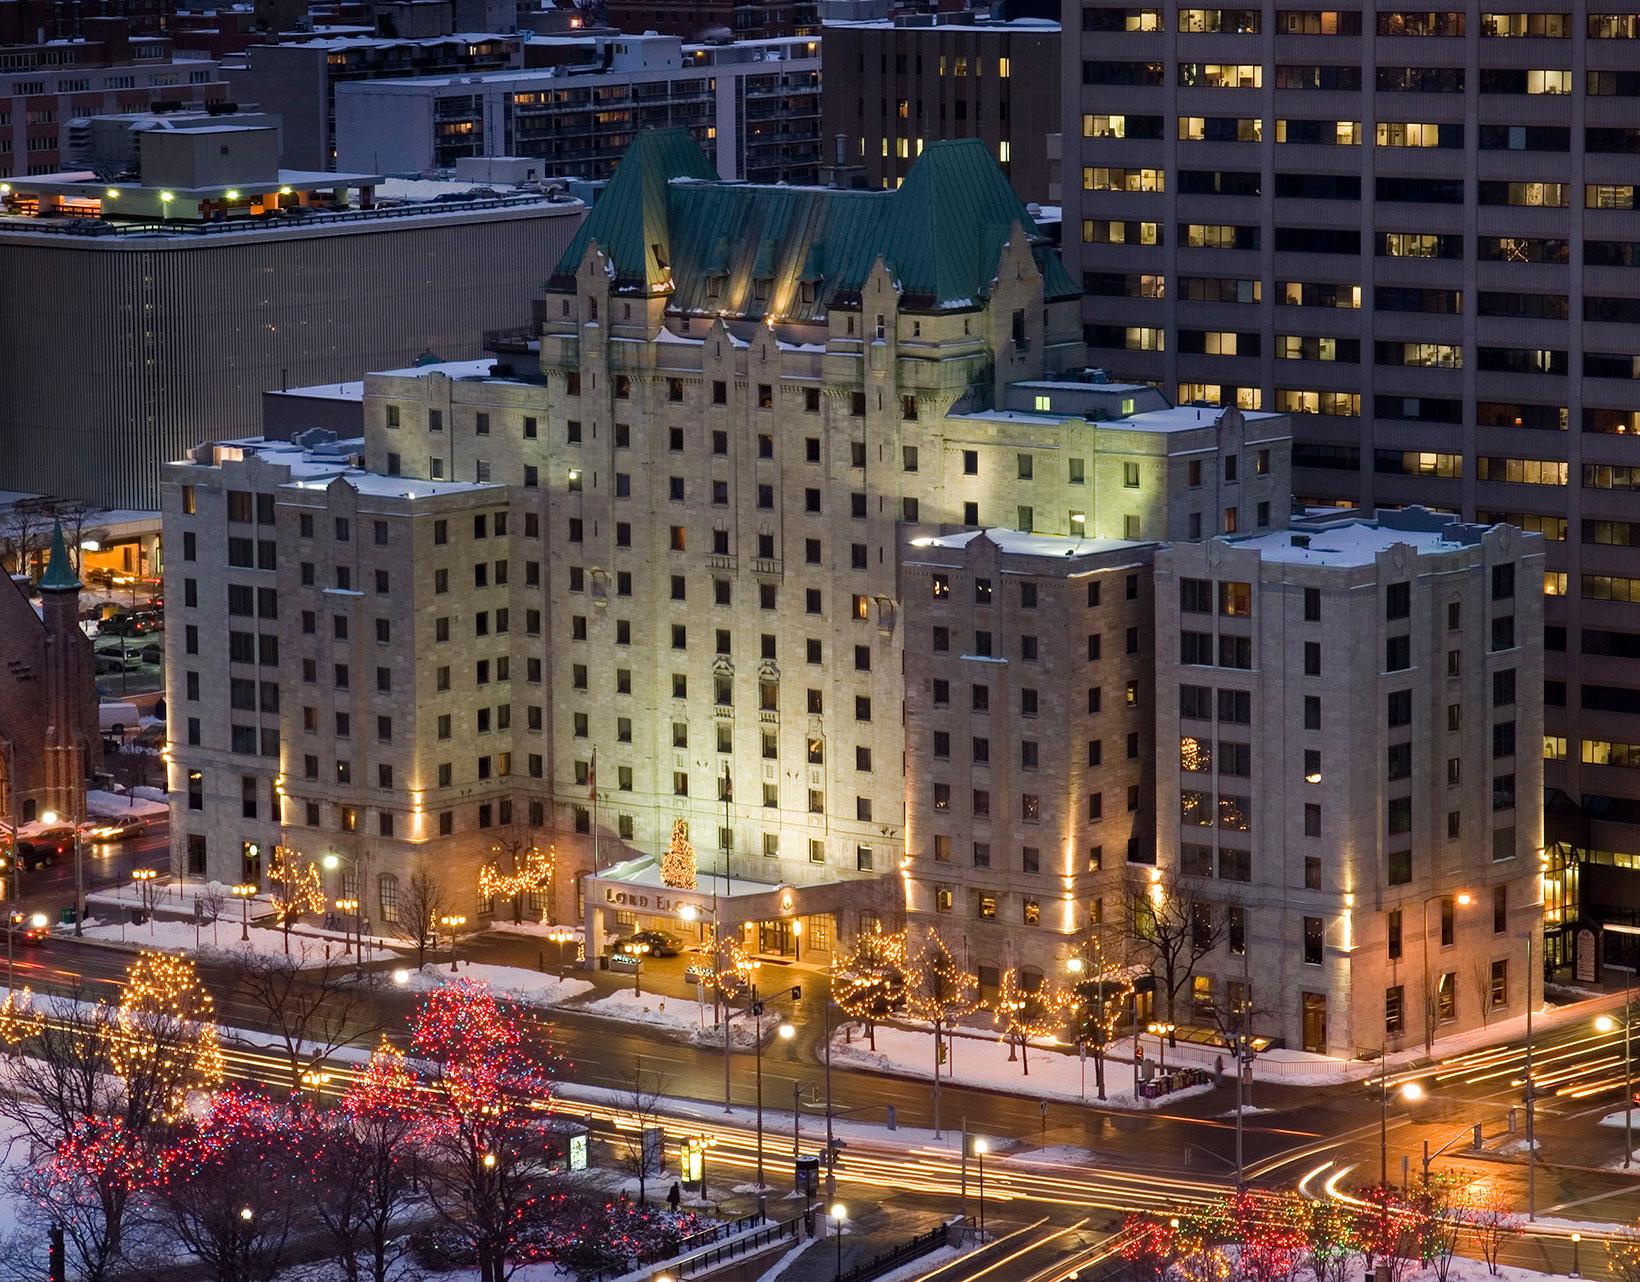 Lord Elgin Ottawa at Christmas time. Festive lights line Elgin Street and illuminate the hotel